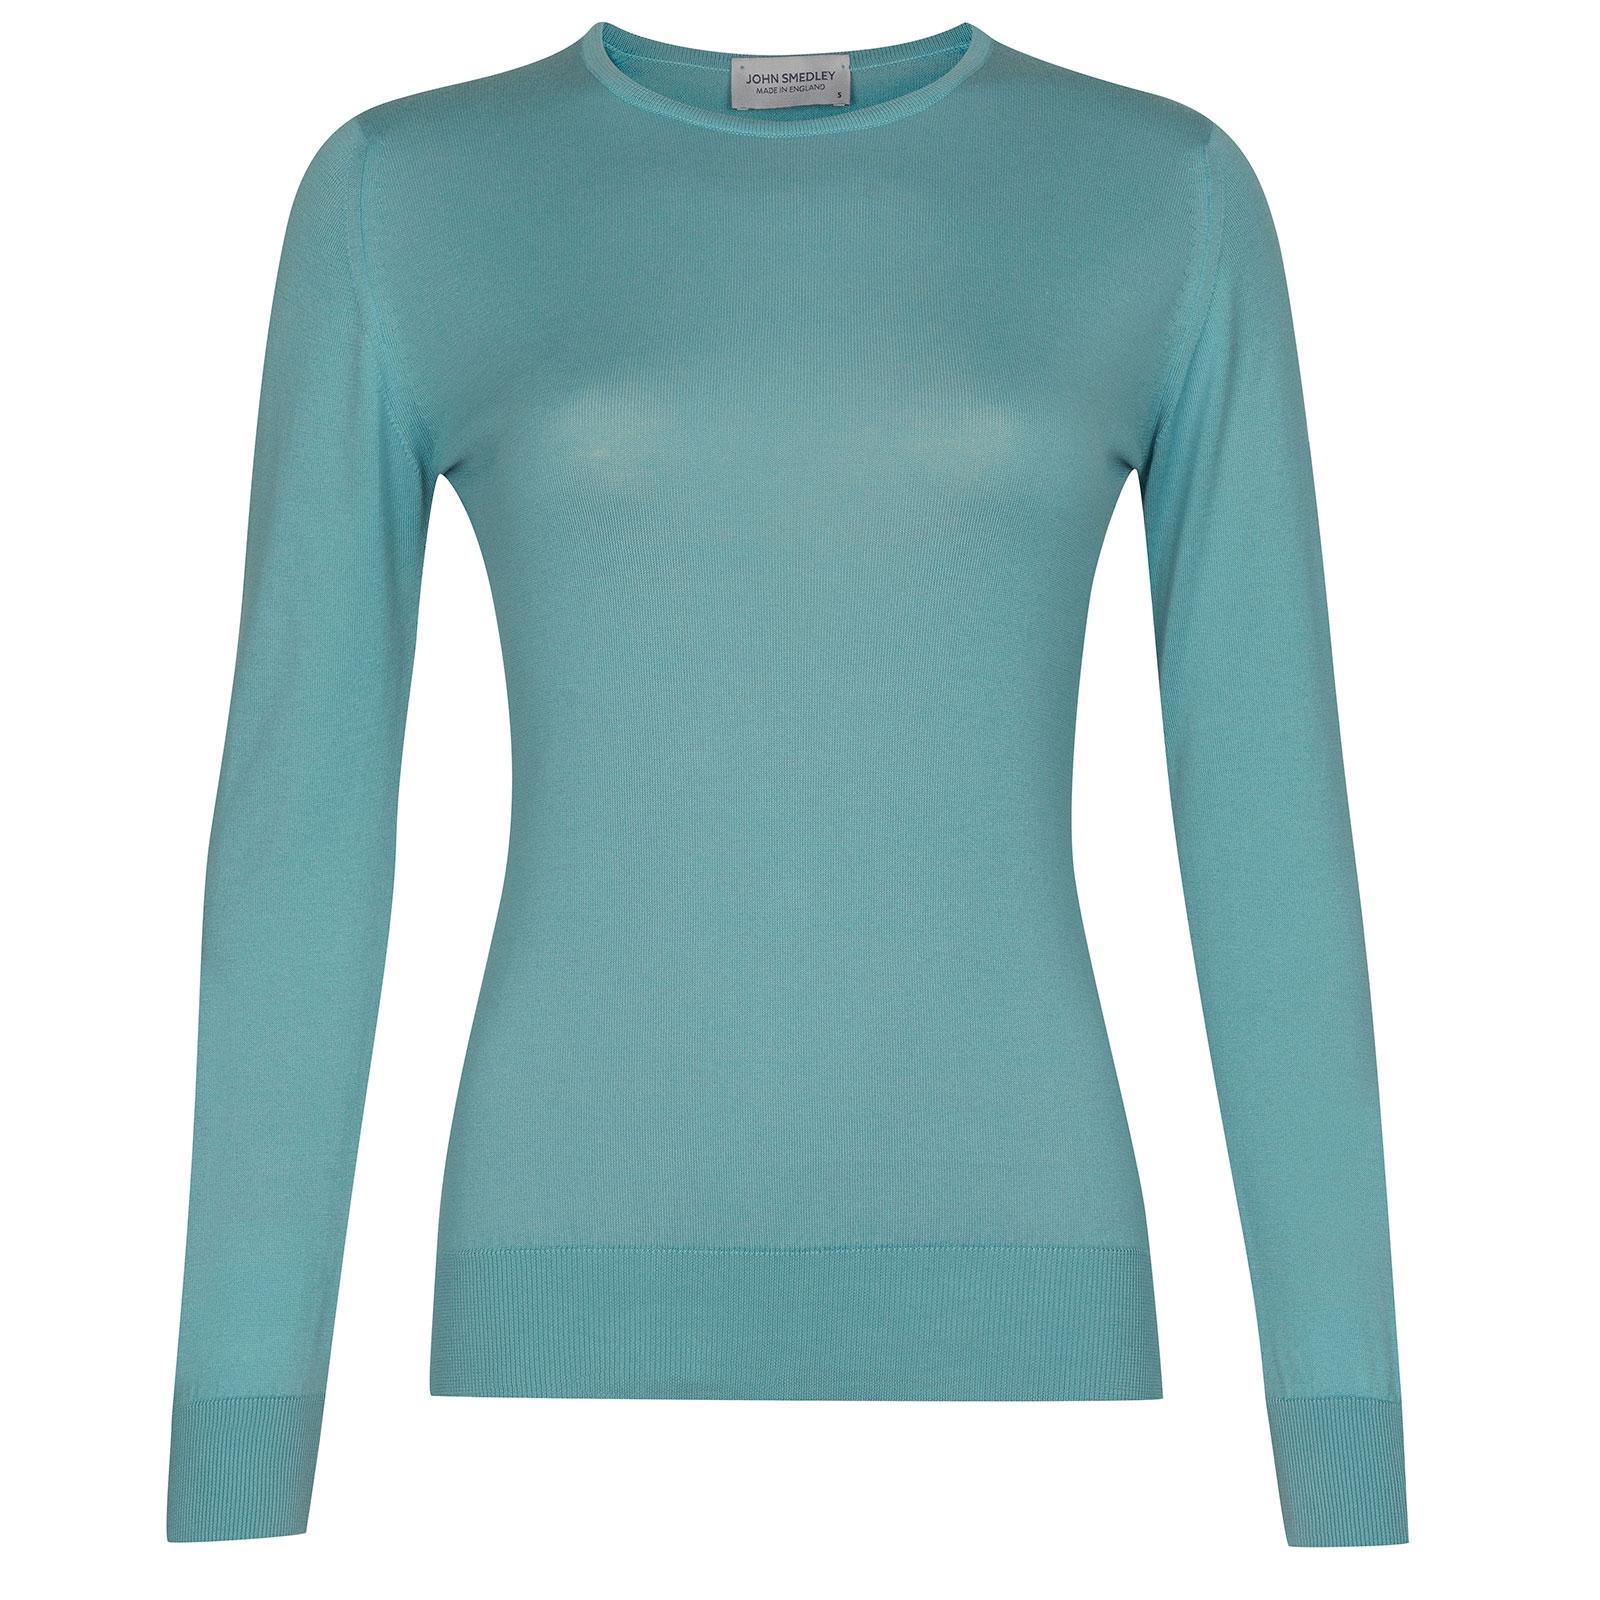 John Smedley Paddington in Empyrean Blue Sweater-XLG